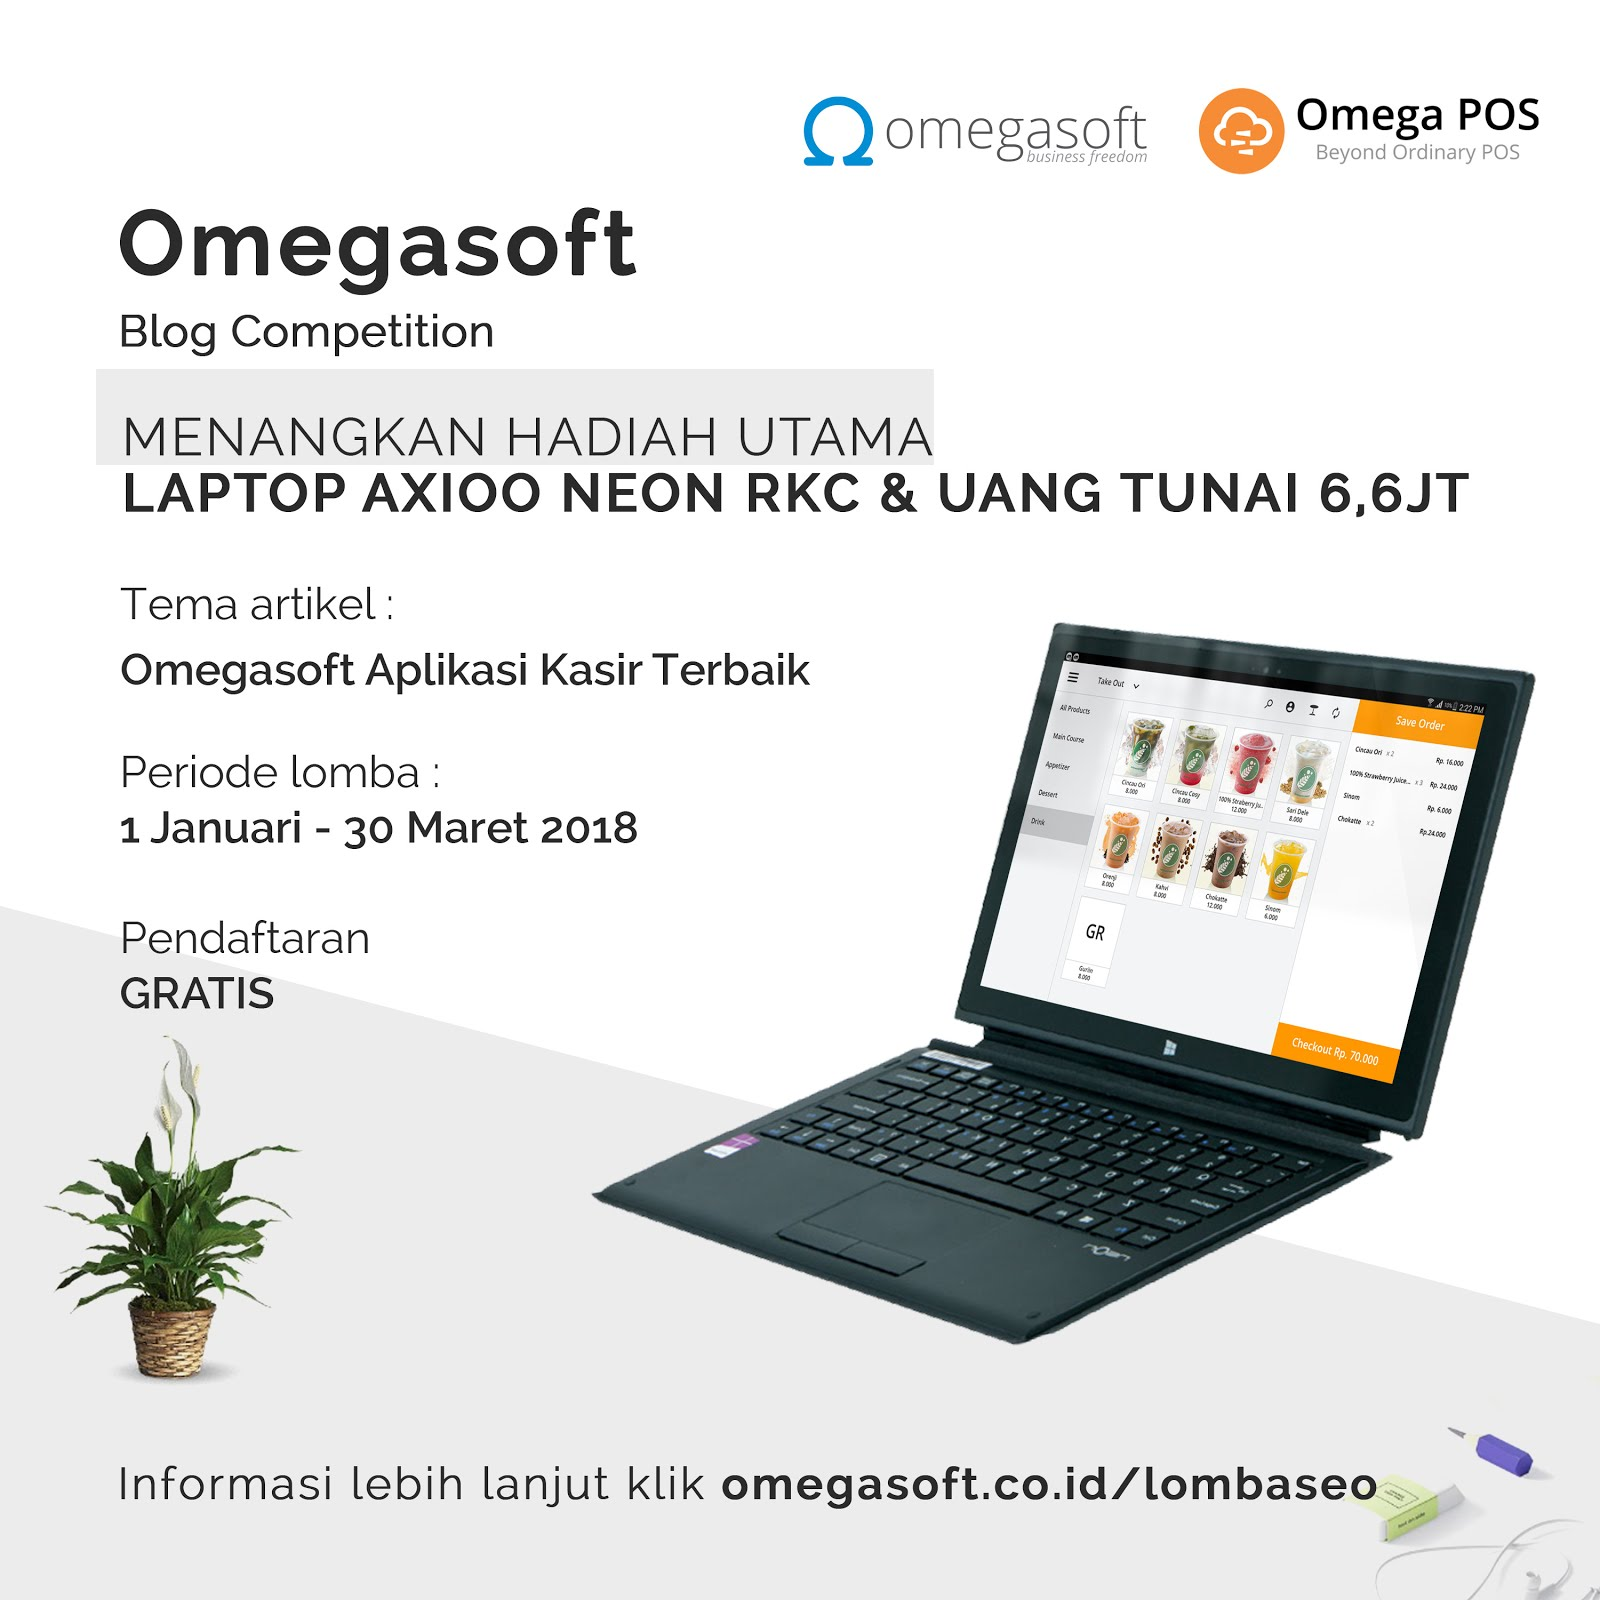 Omegasoft Blog Competition 2018